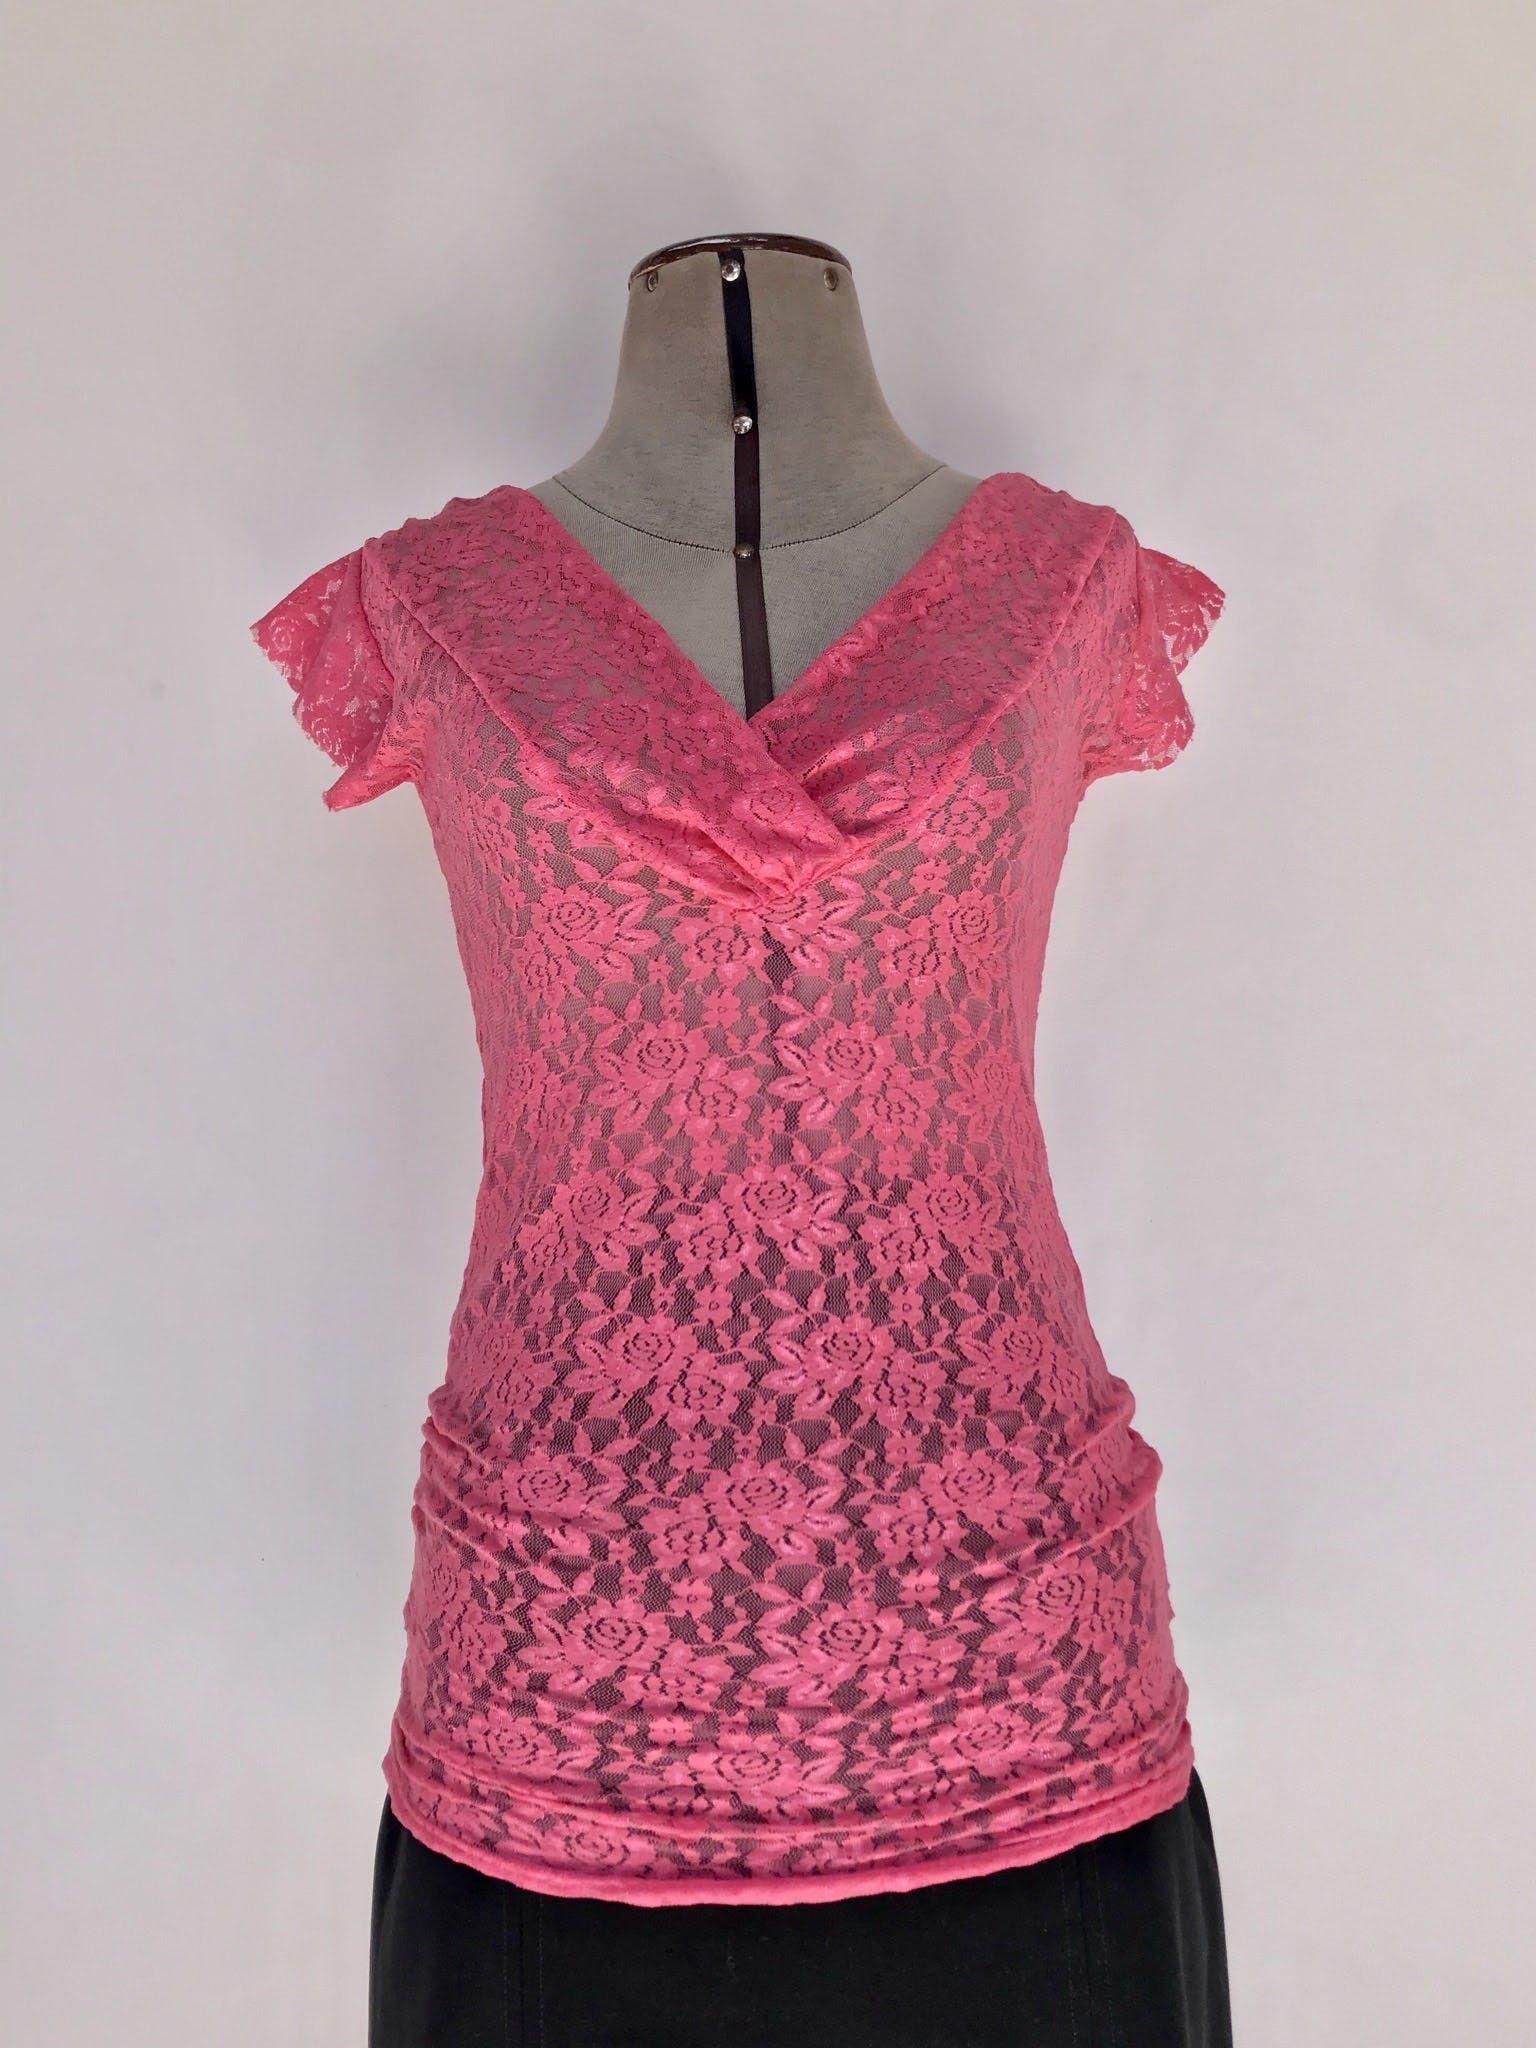 Blusa de encaje rosa, escote en V cruzado Talla S